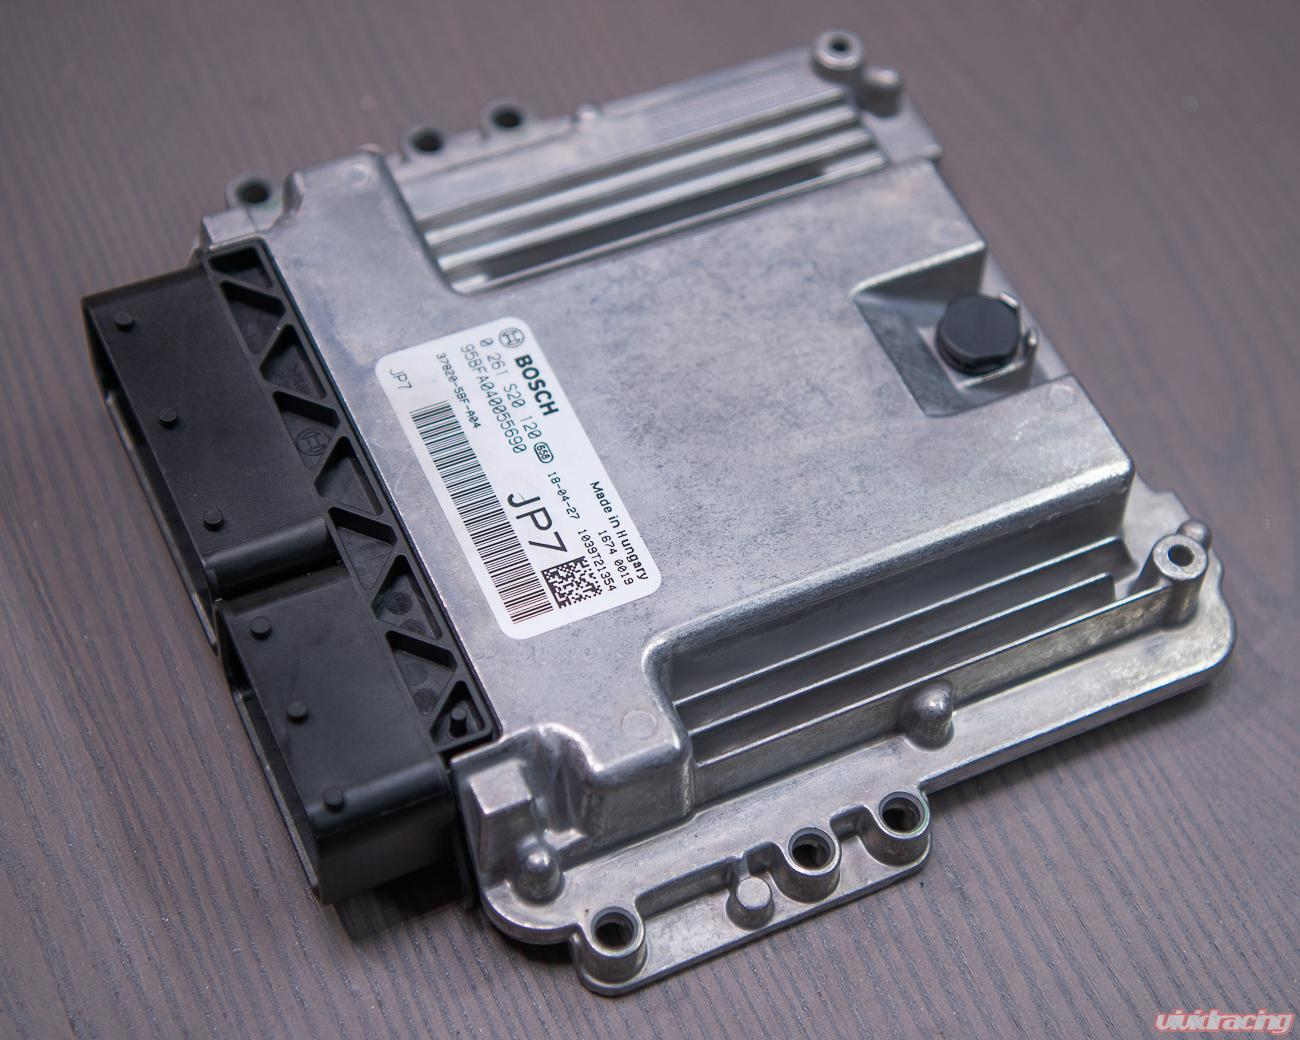 VR Tuned ECU Flash Tune Honda Civic Type-R Gen 10 FK8 2 0L Turbo 320HP